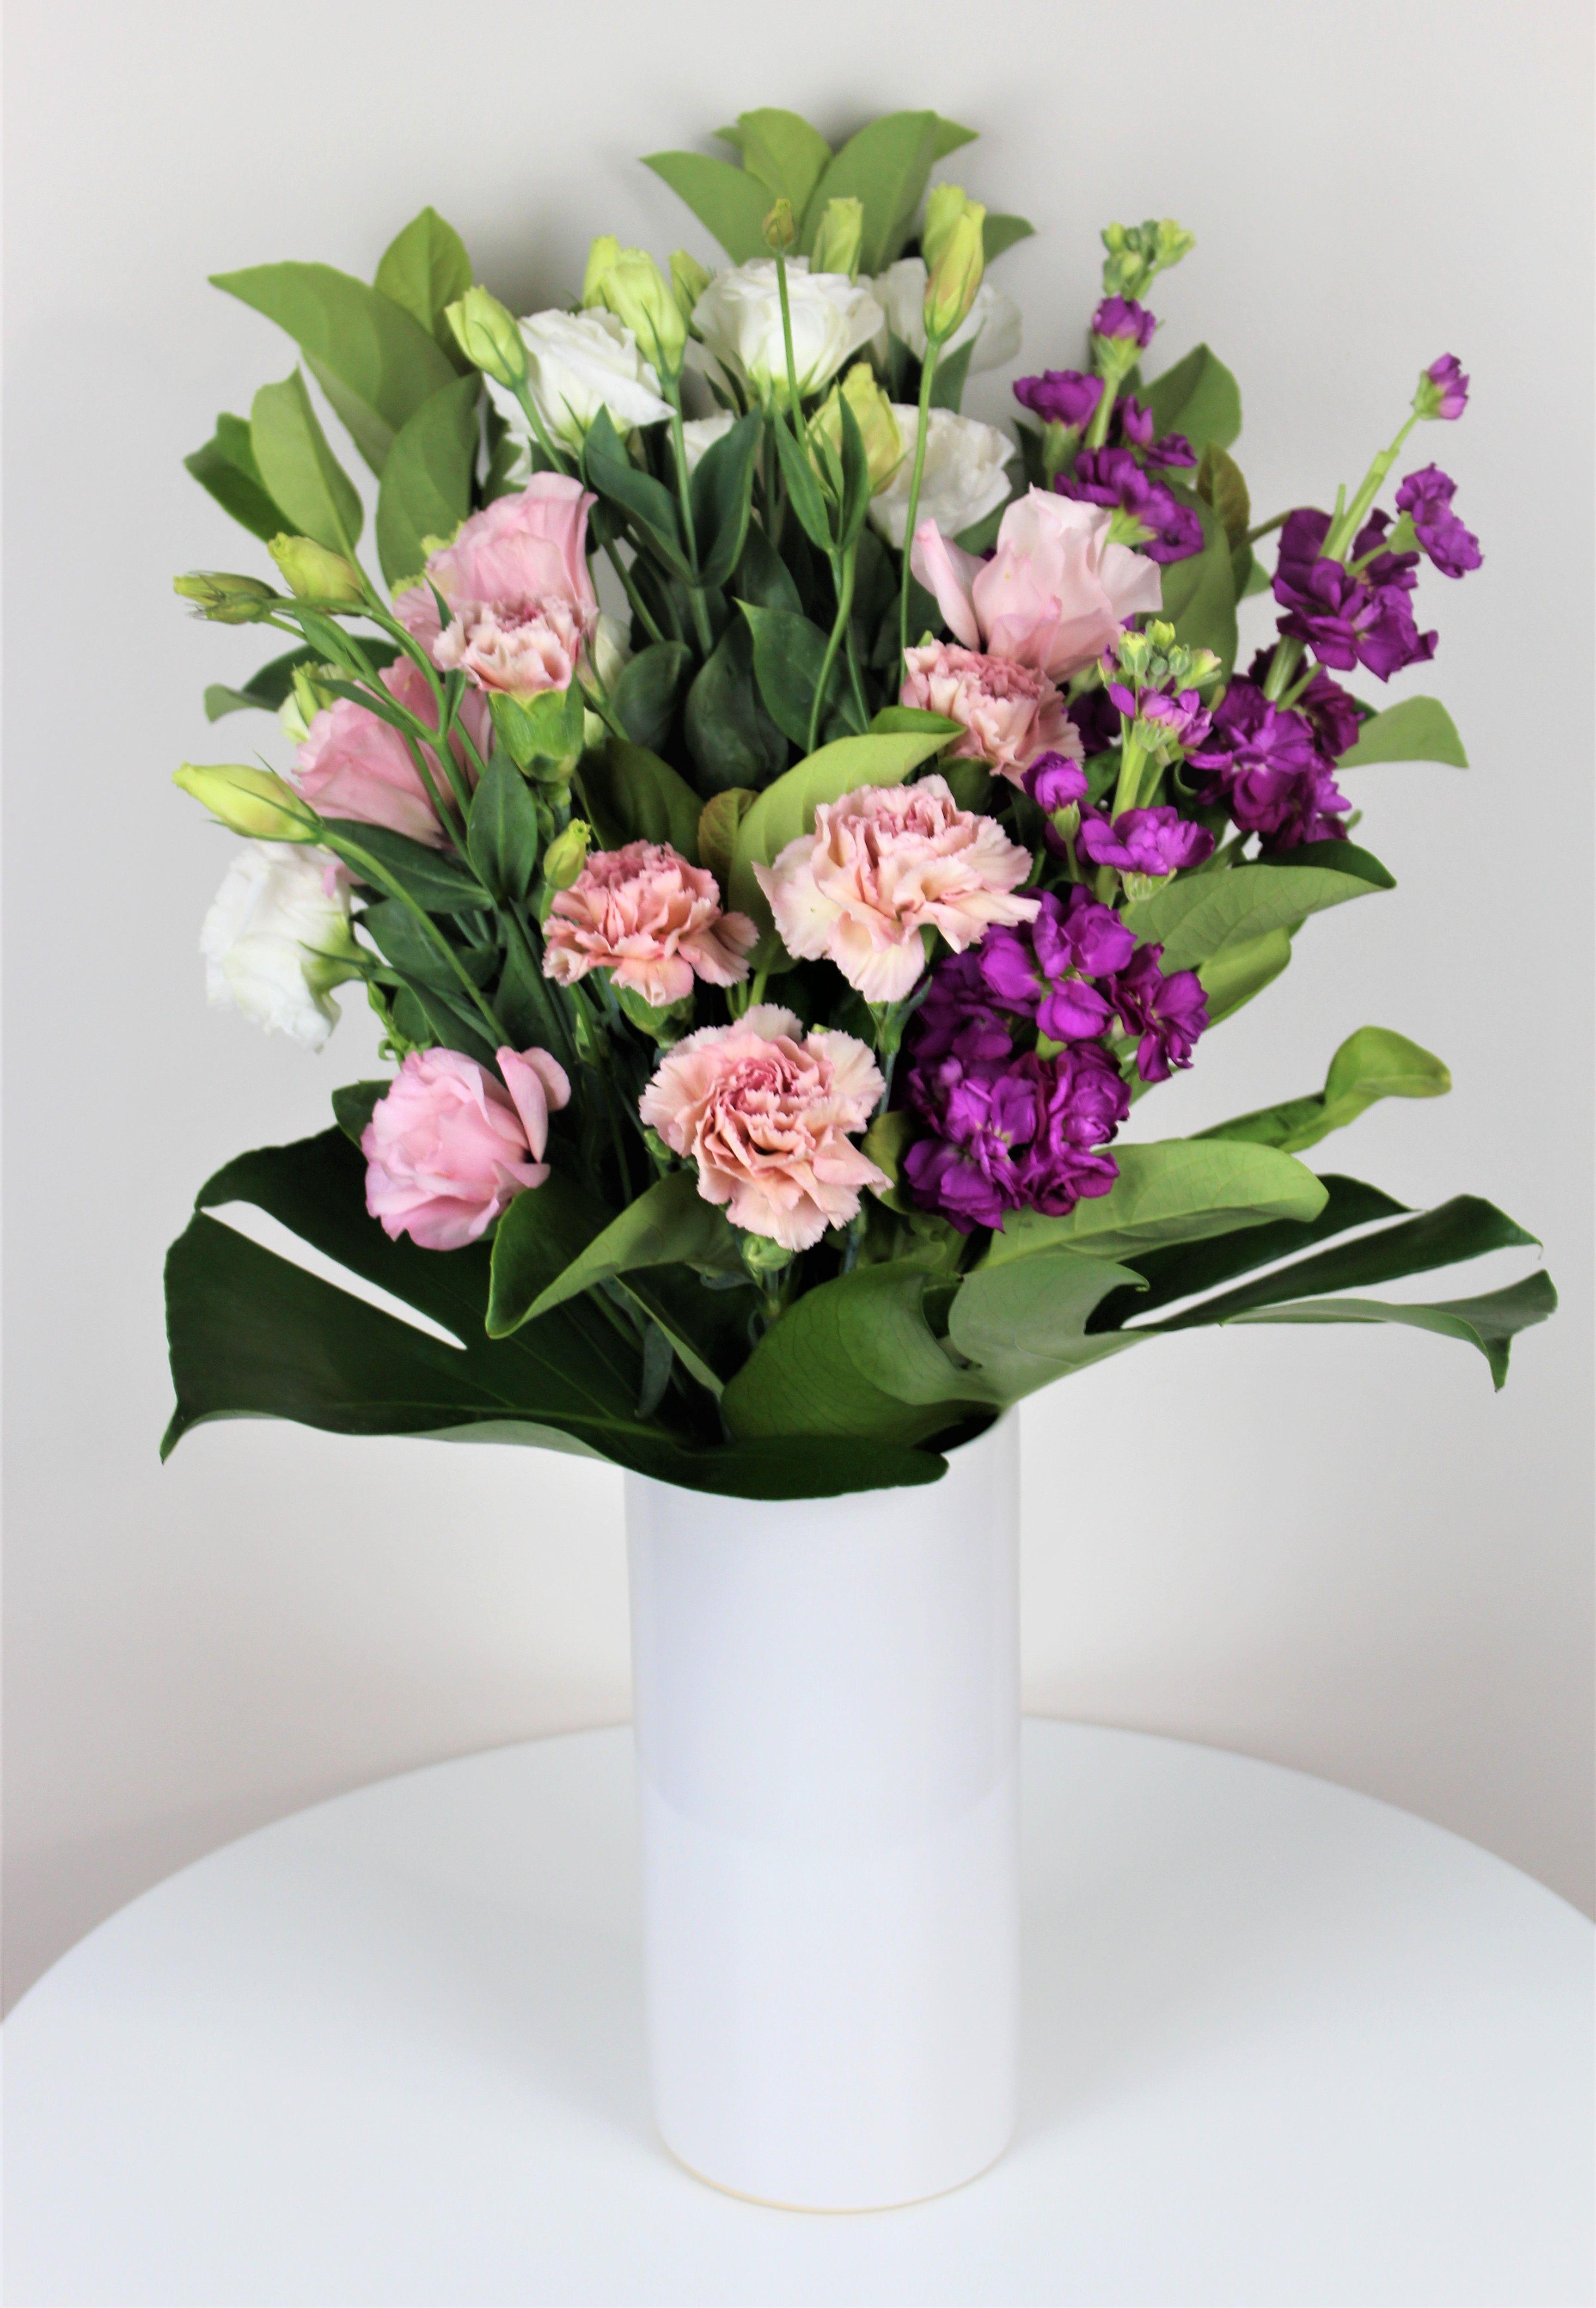 Buy classic vase arrangement in Melbourne in 2020 Cheap